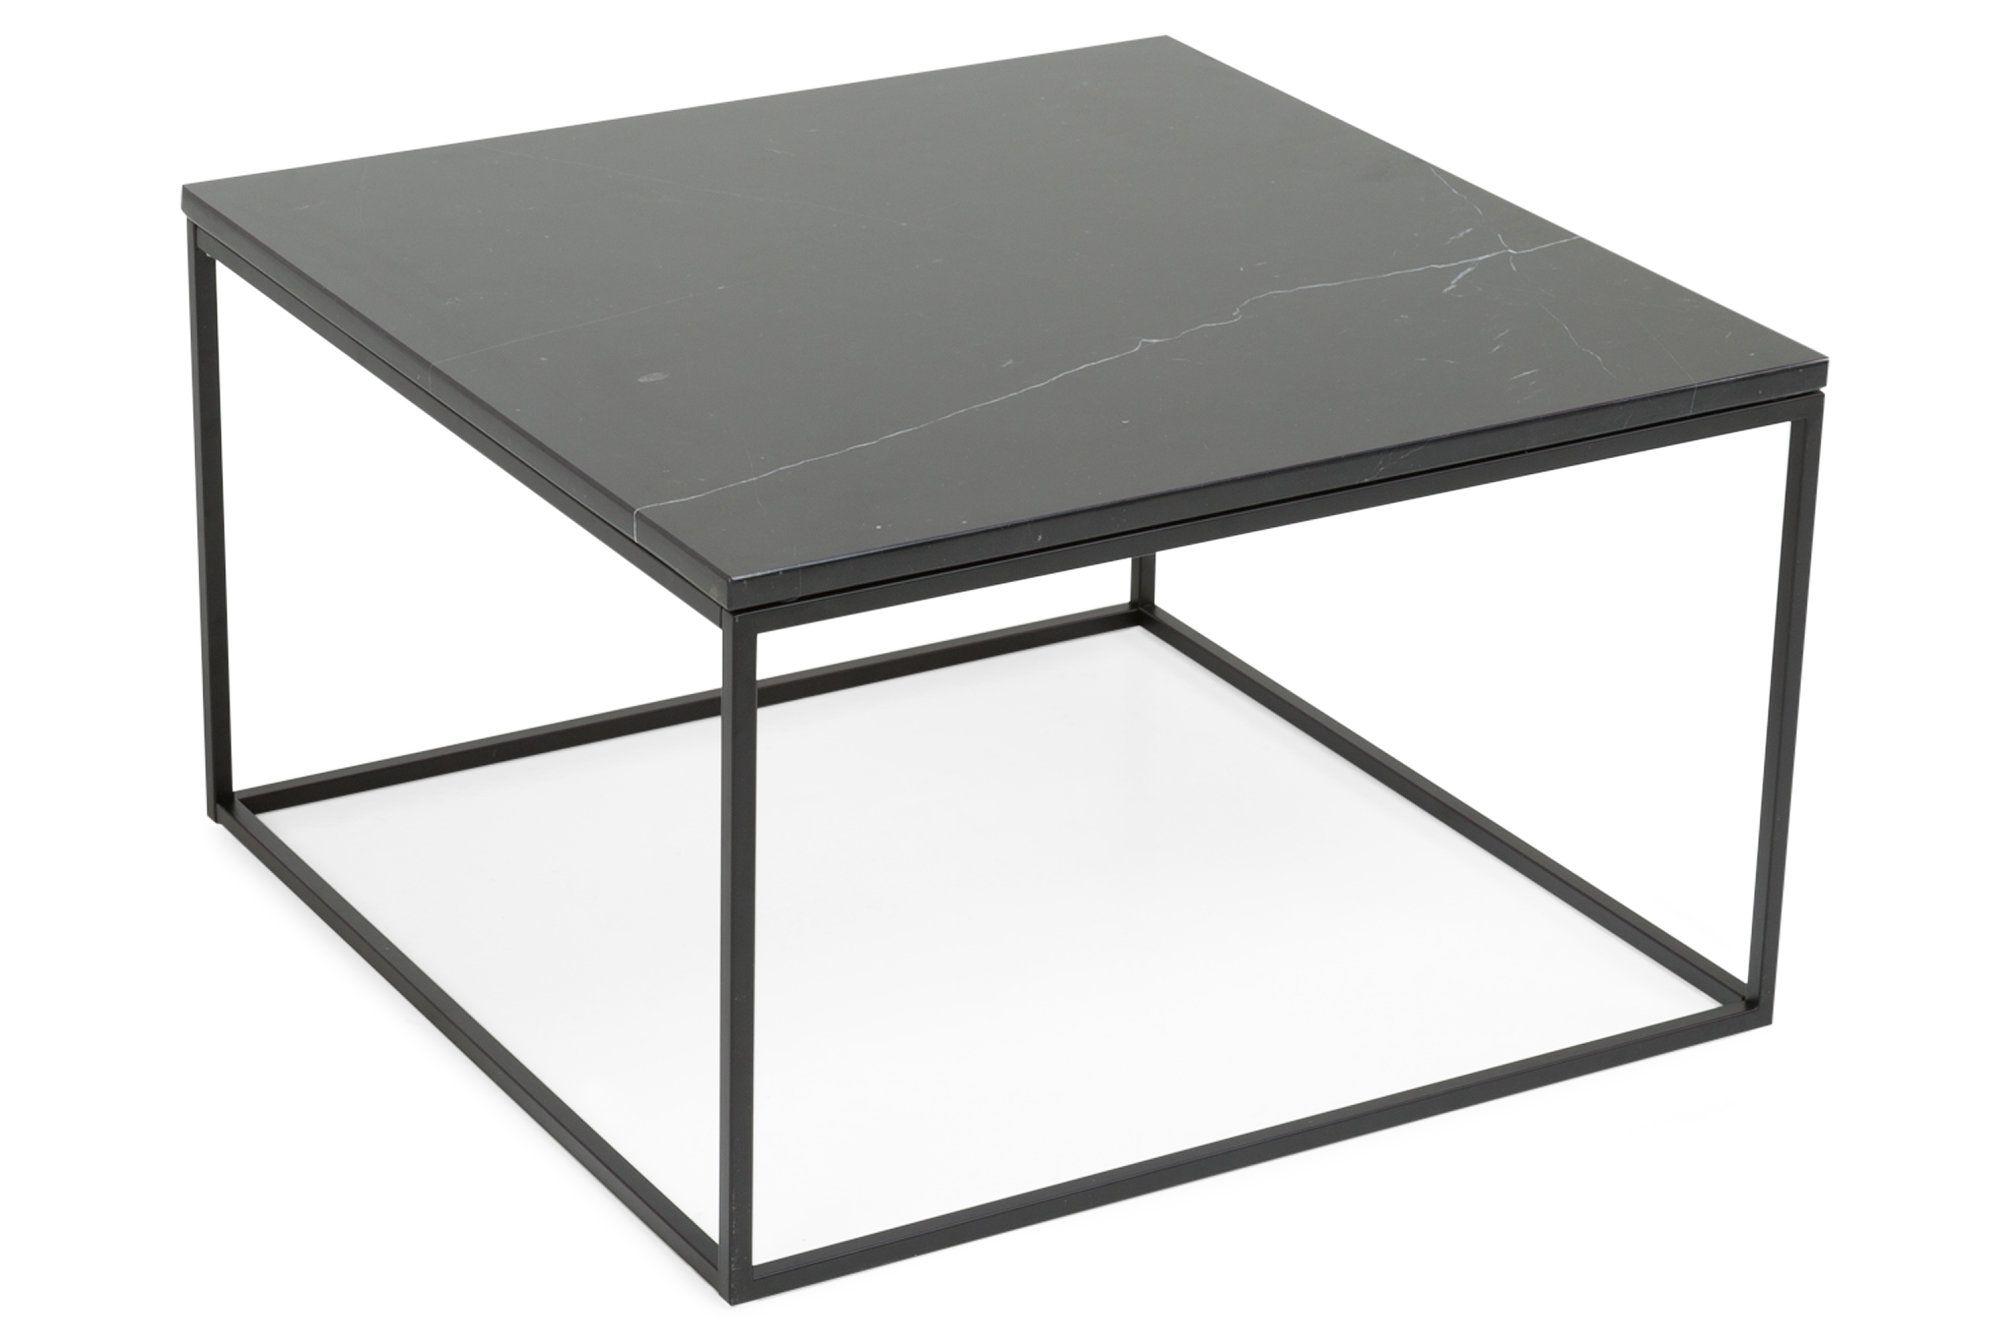 Carrie Soffbord 75 cm Marmor in 2019 Vill ha Inredning Furniture, Table, Decor